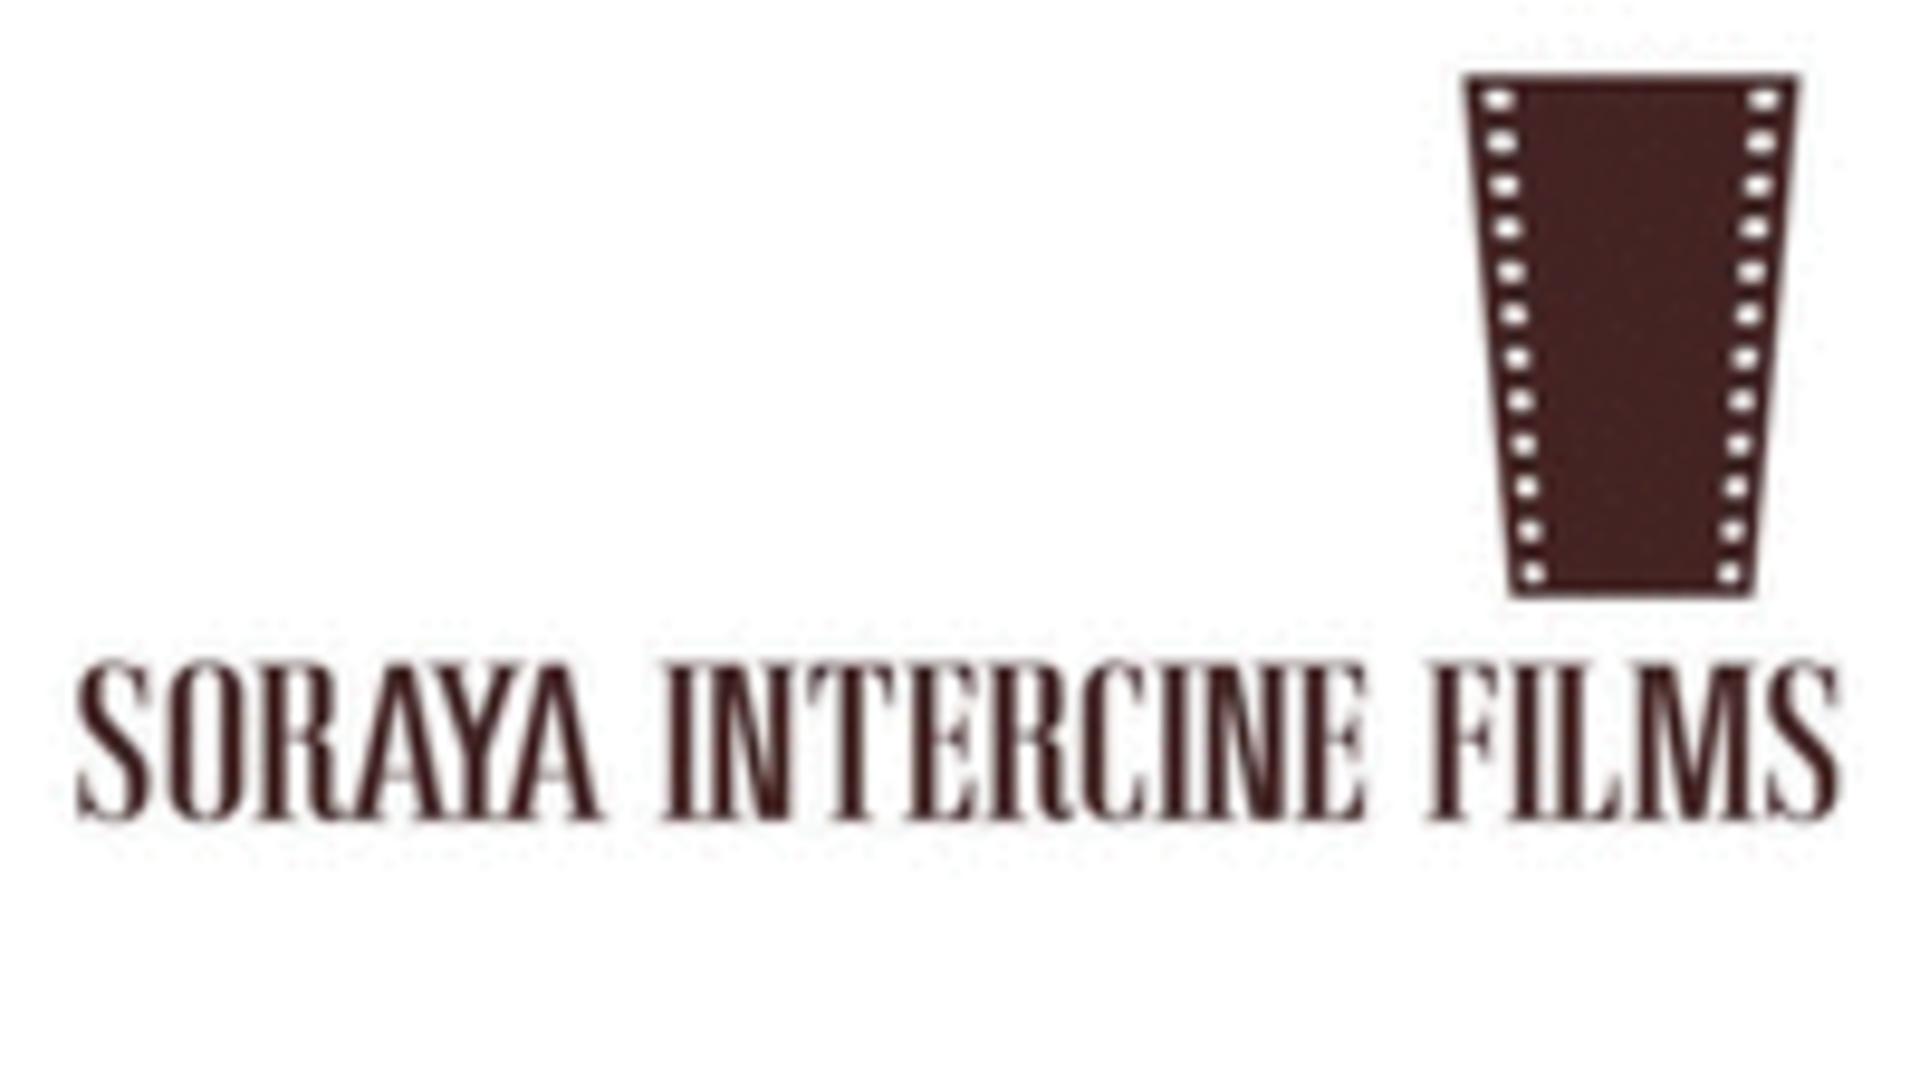 PT. Soraya Intercine Film